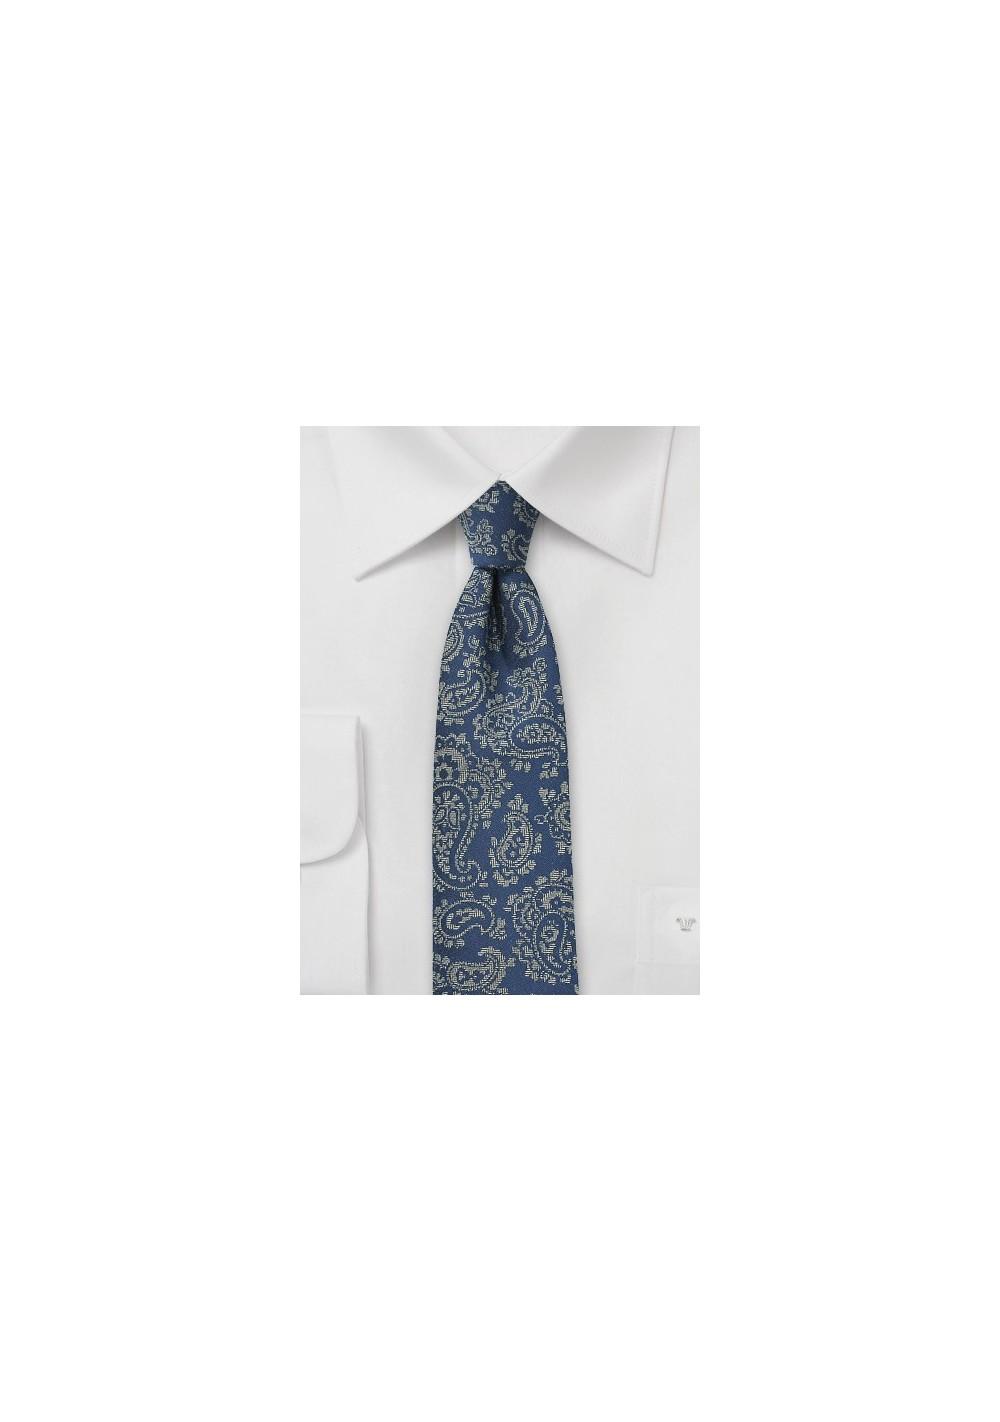 Blue Slim Cut Tie with Gray Paisley